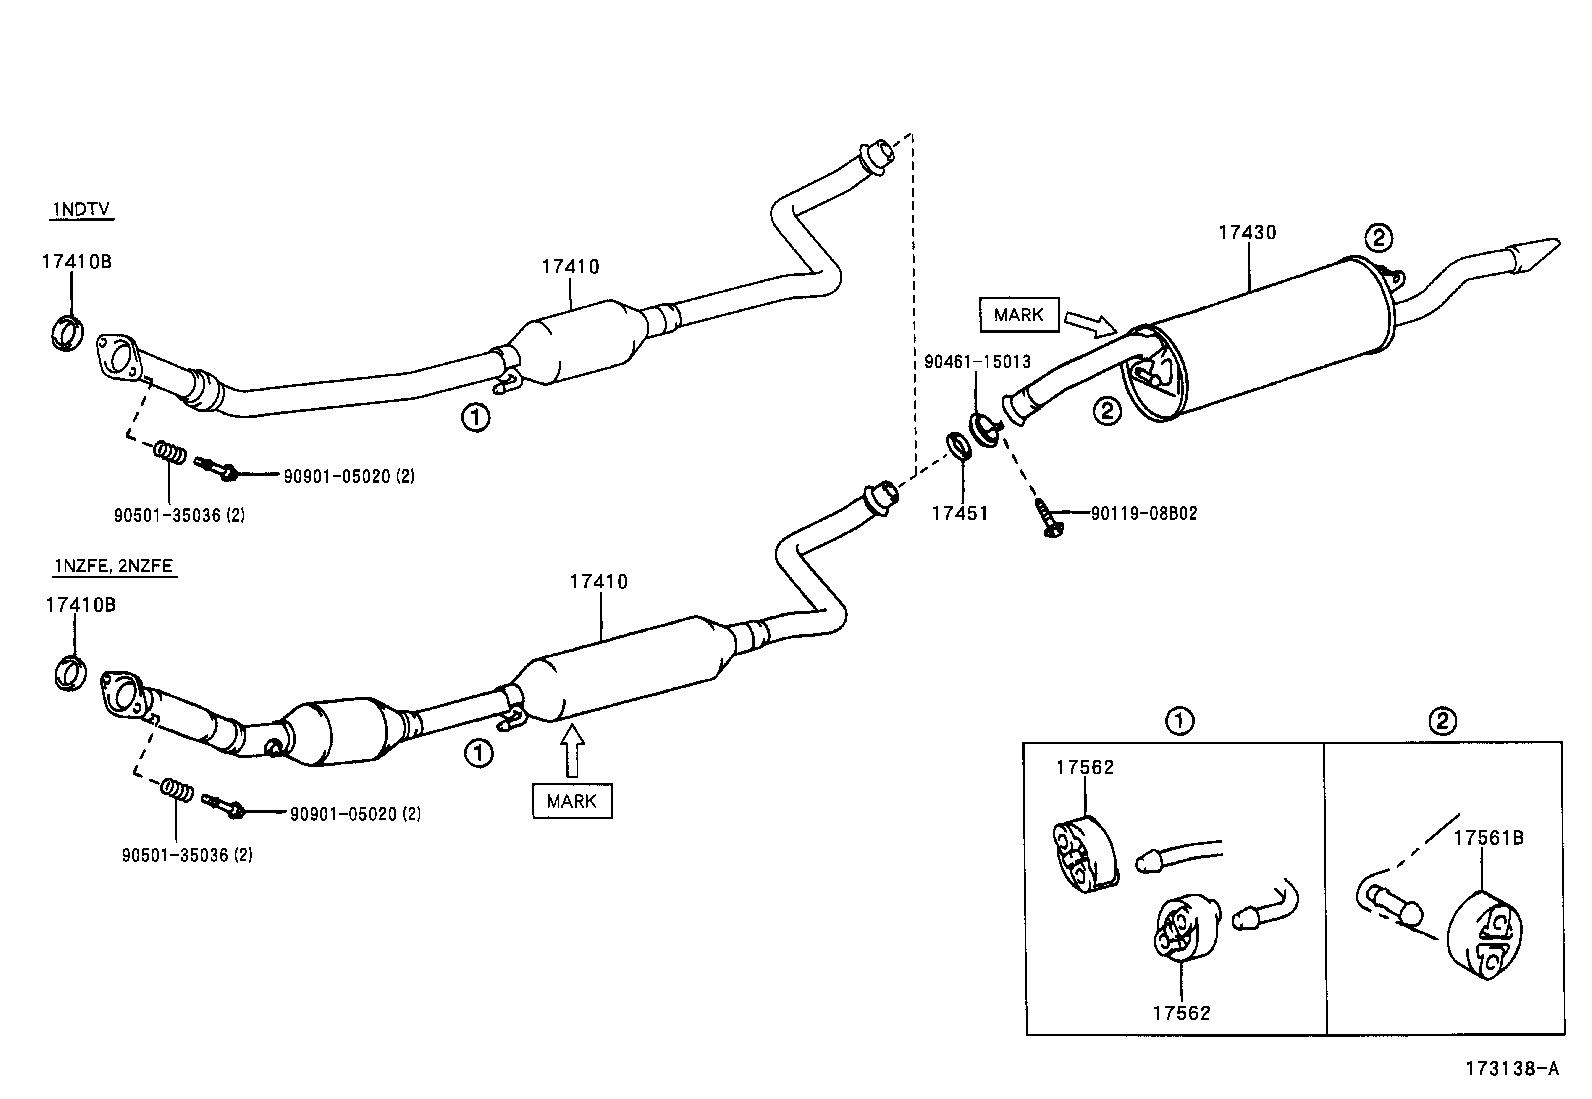 2008 Yaris Serpentine Belt Diagram